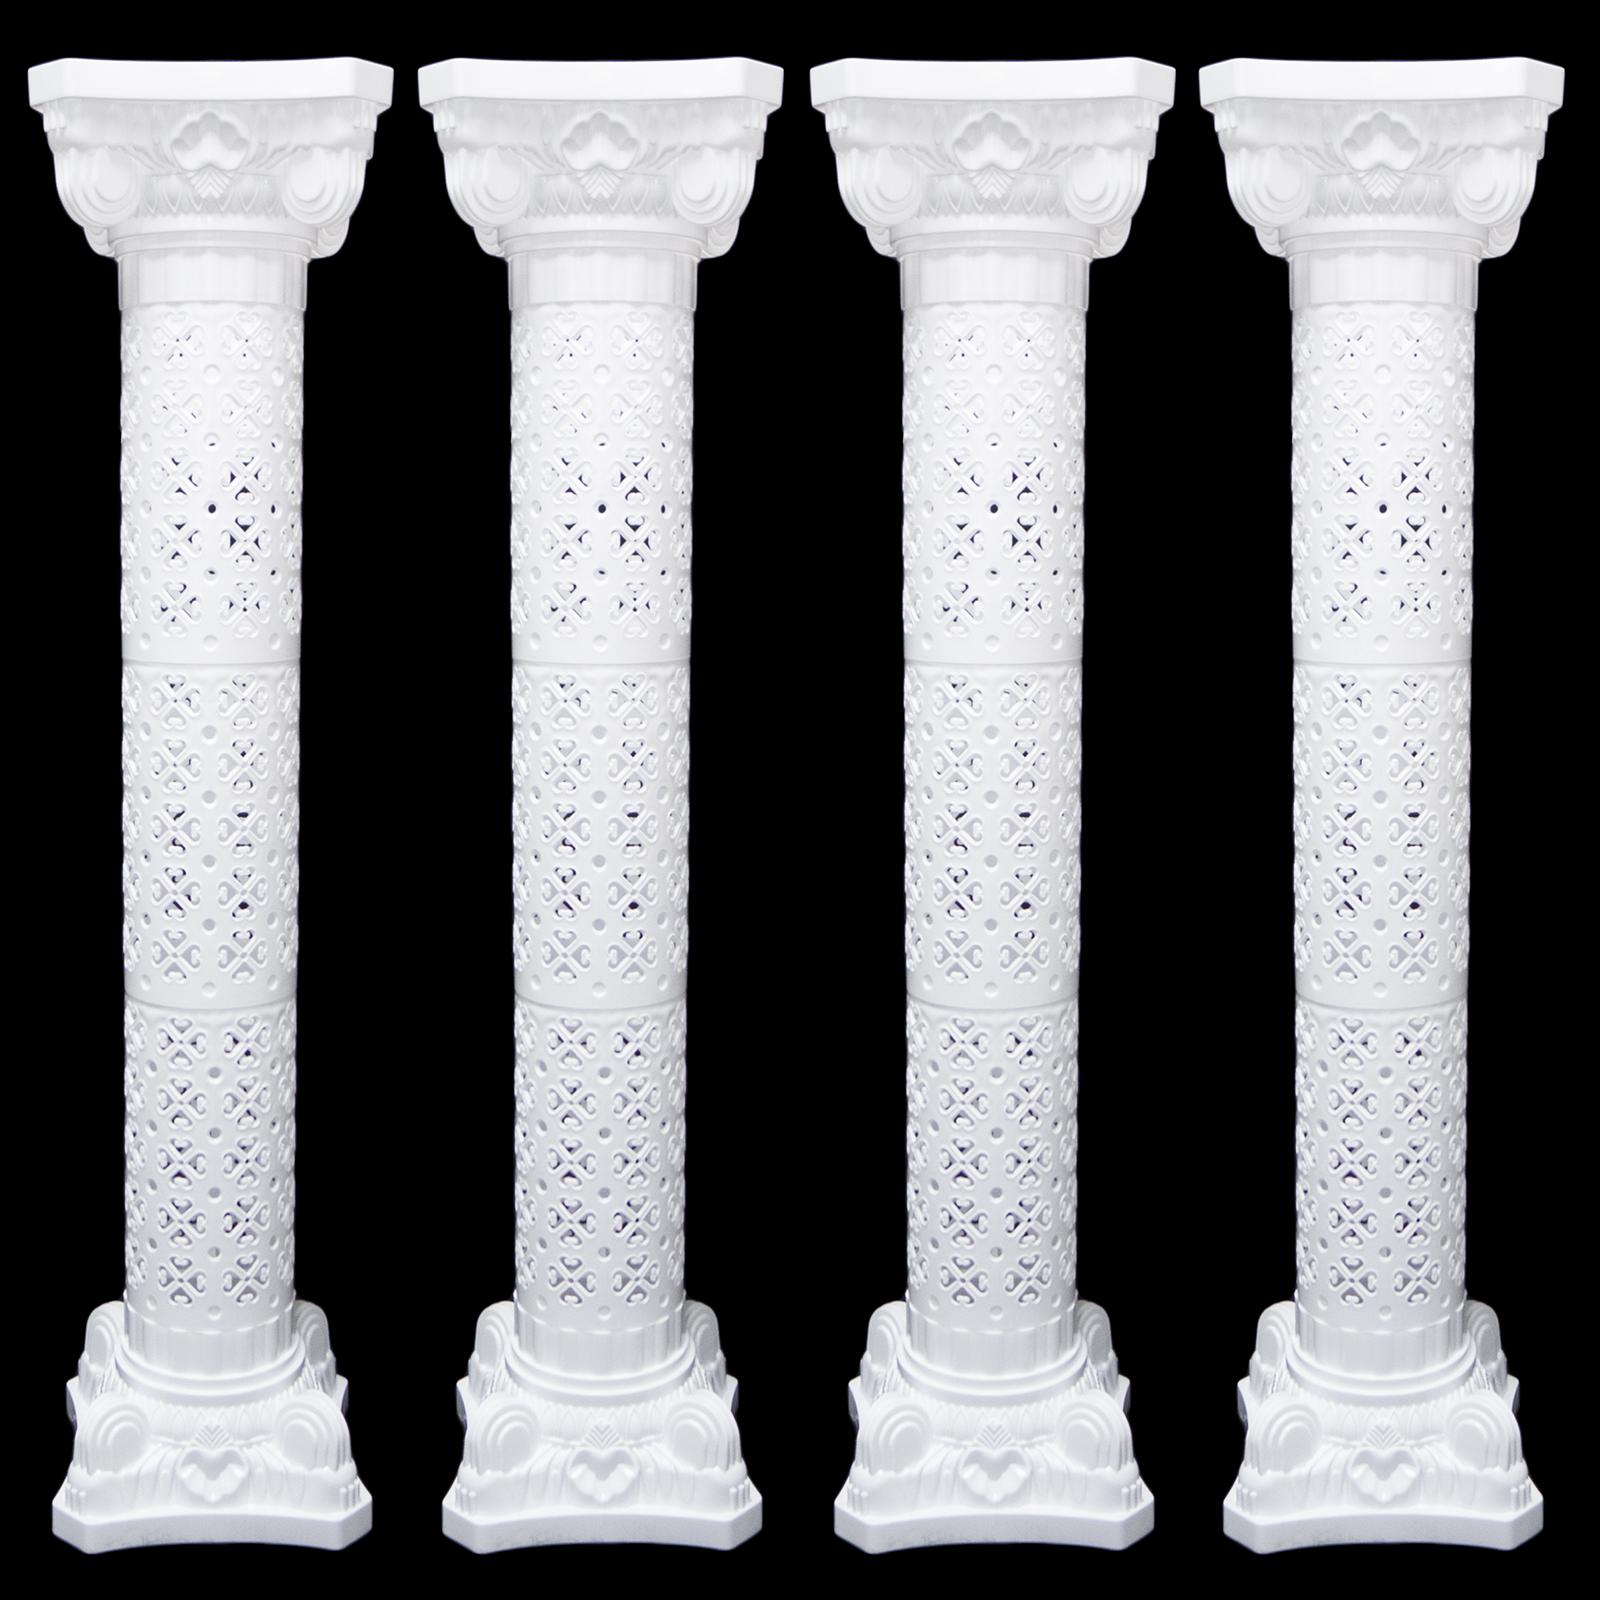 Wedding Decorative Plastic Roman Column Height Adjustable. Houzz White Kitchen. Kitchens White. Kitchen Island With Raised Bar. Black Grey And White Kitchen. Ikea Kitchen Island With Seating. Oversized Kitchen Islands. White Kitchen Glass Splashback. Small Kitchen Islands Ideas